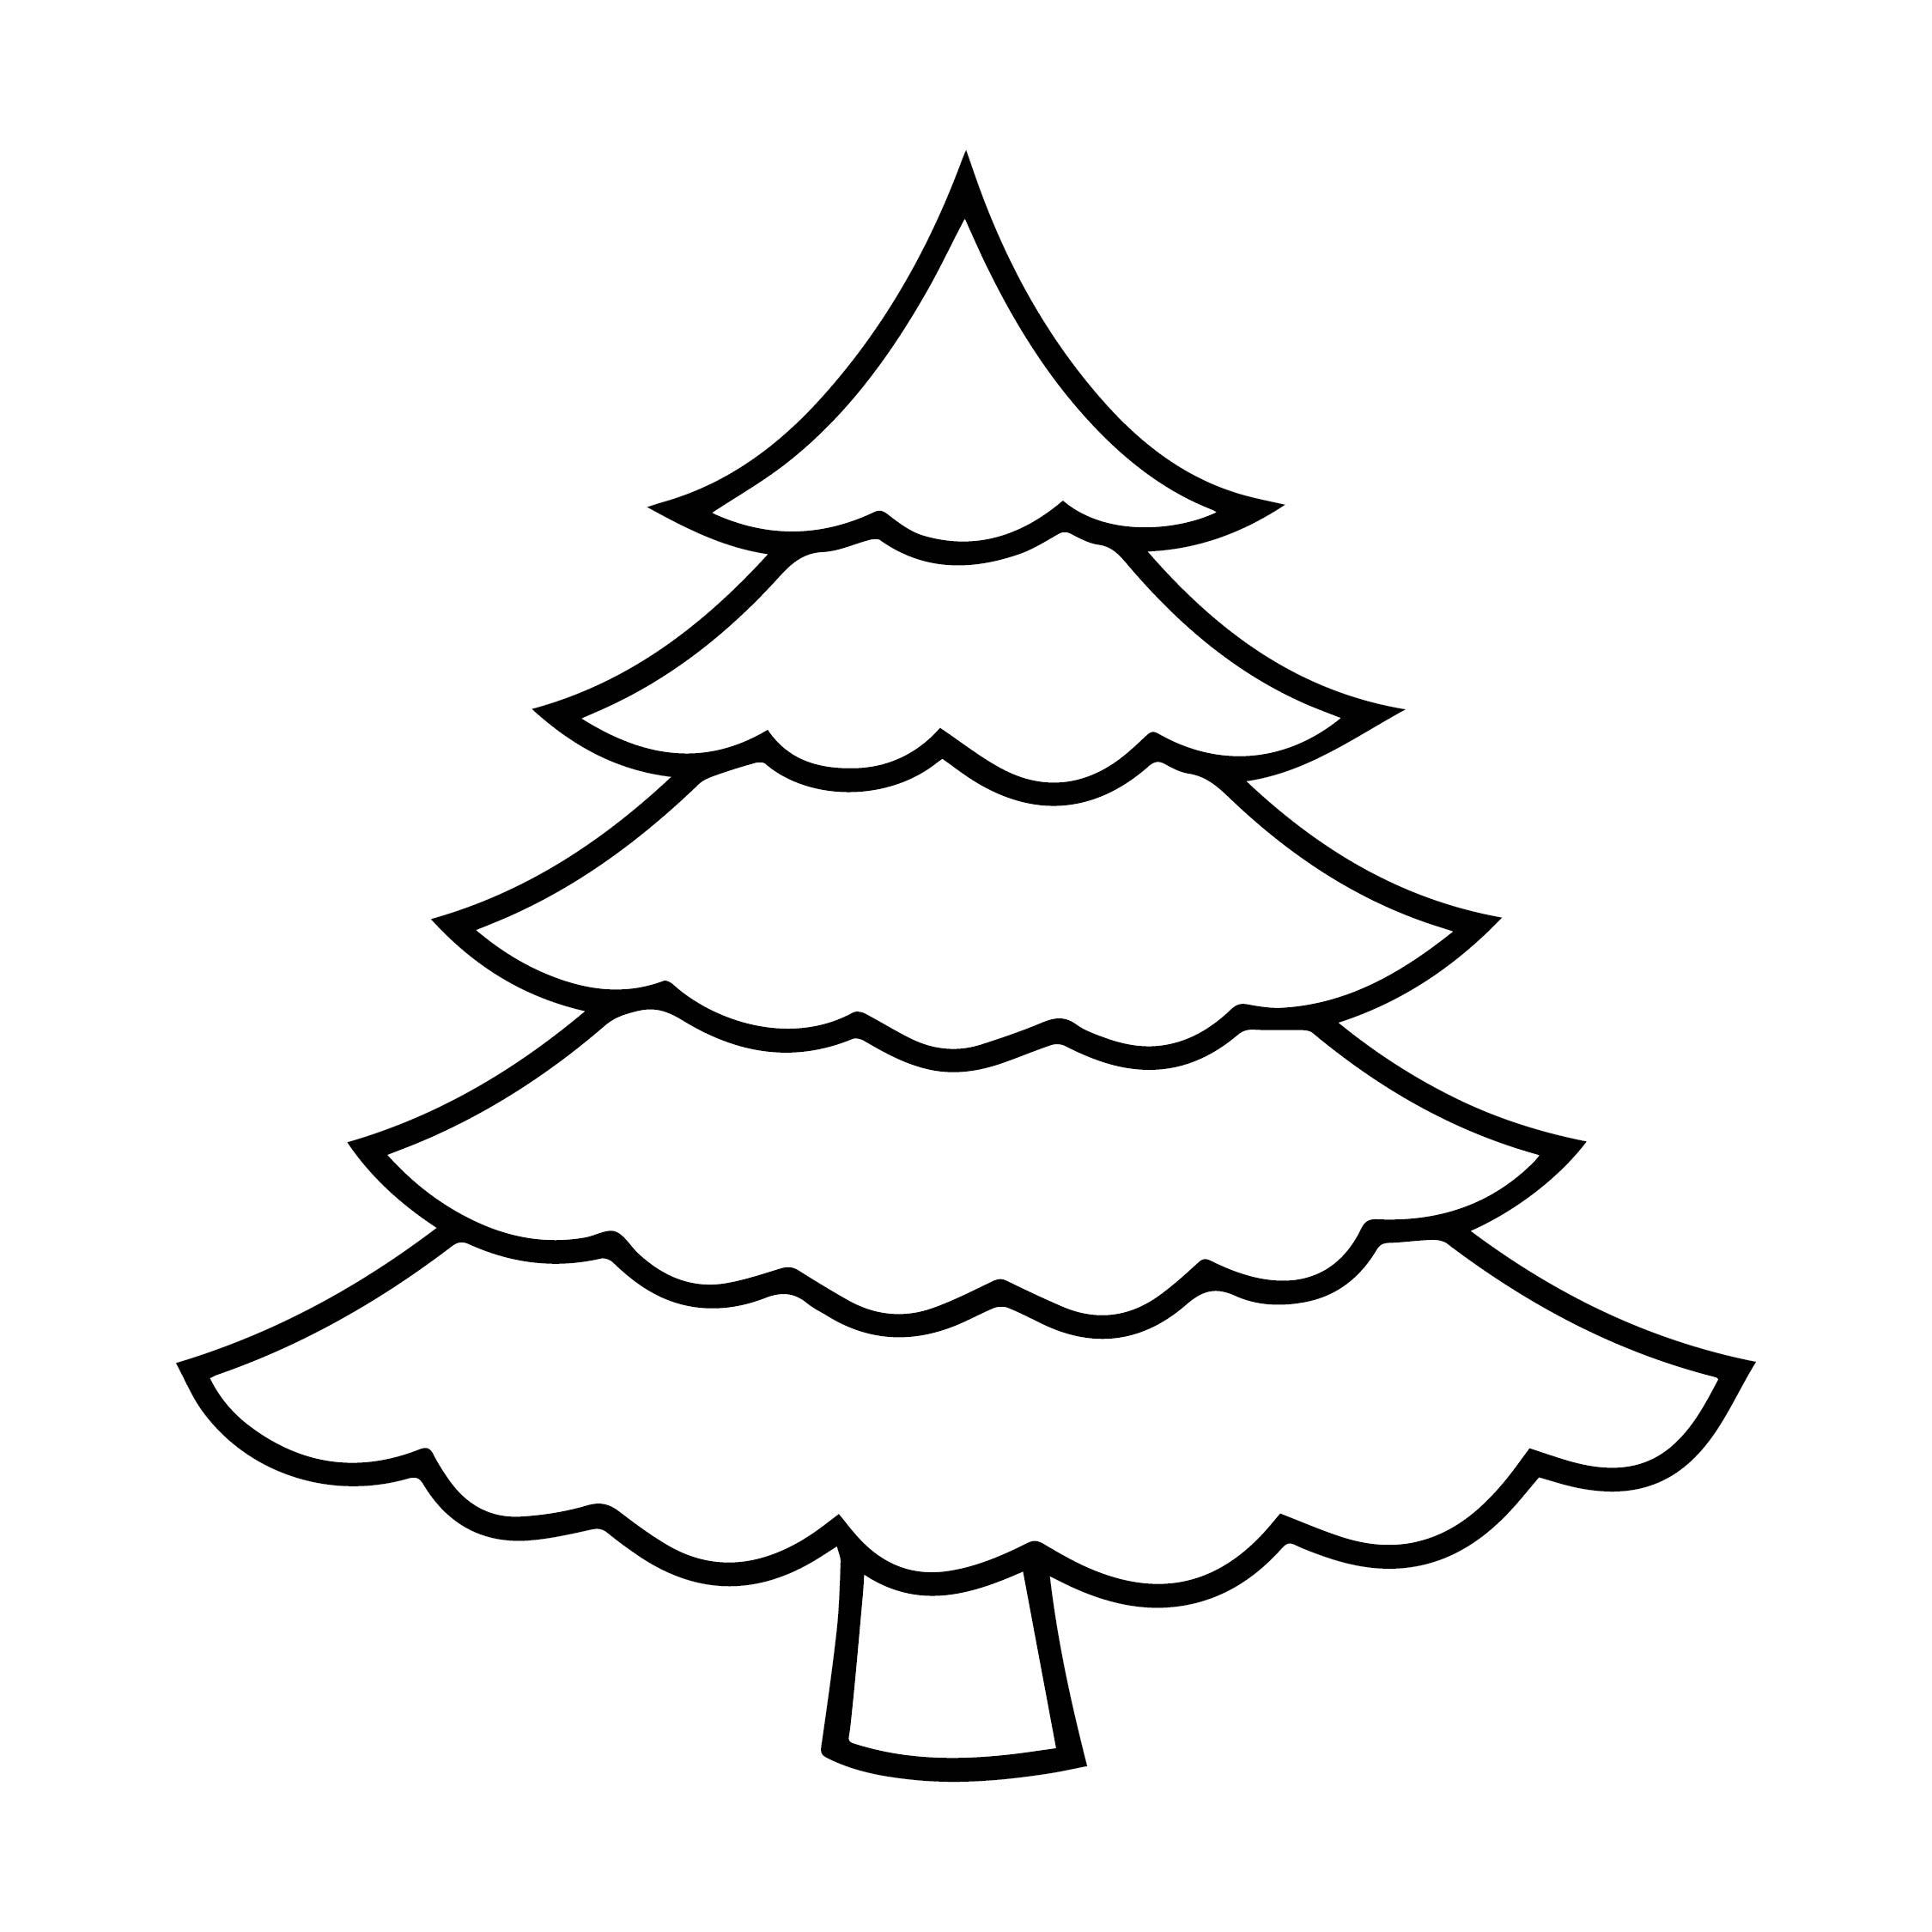 Coloring Christmas Tree Clip Art